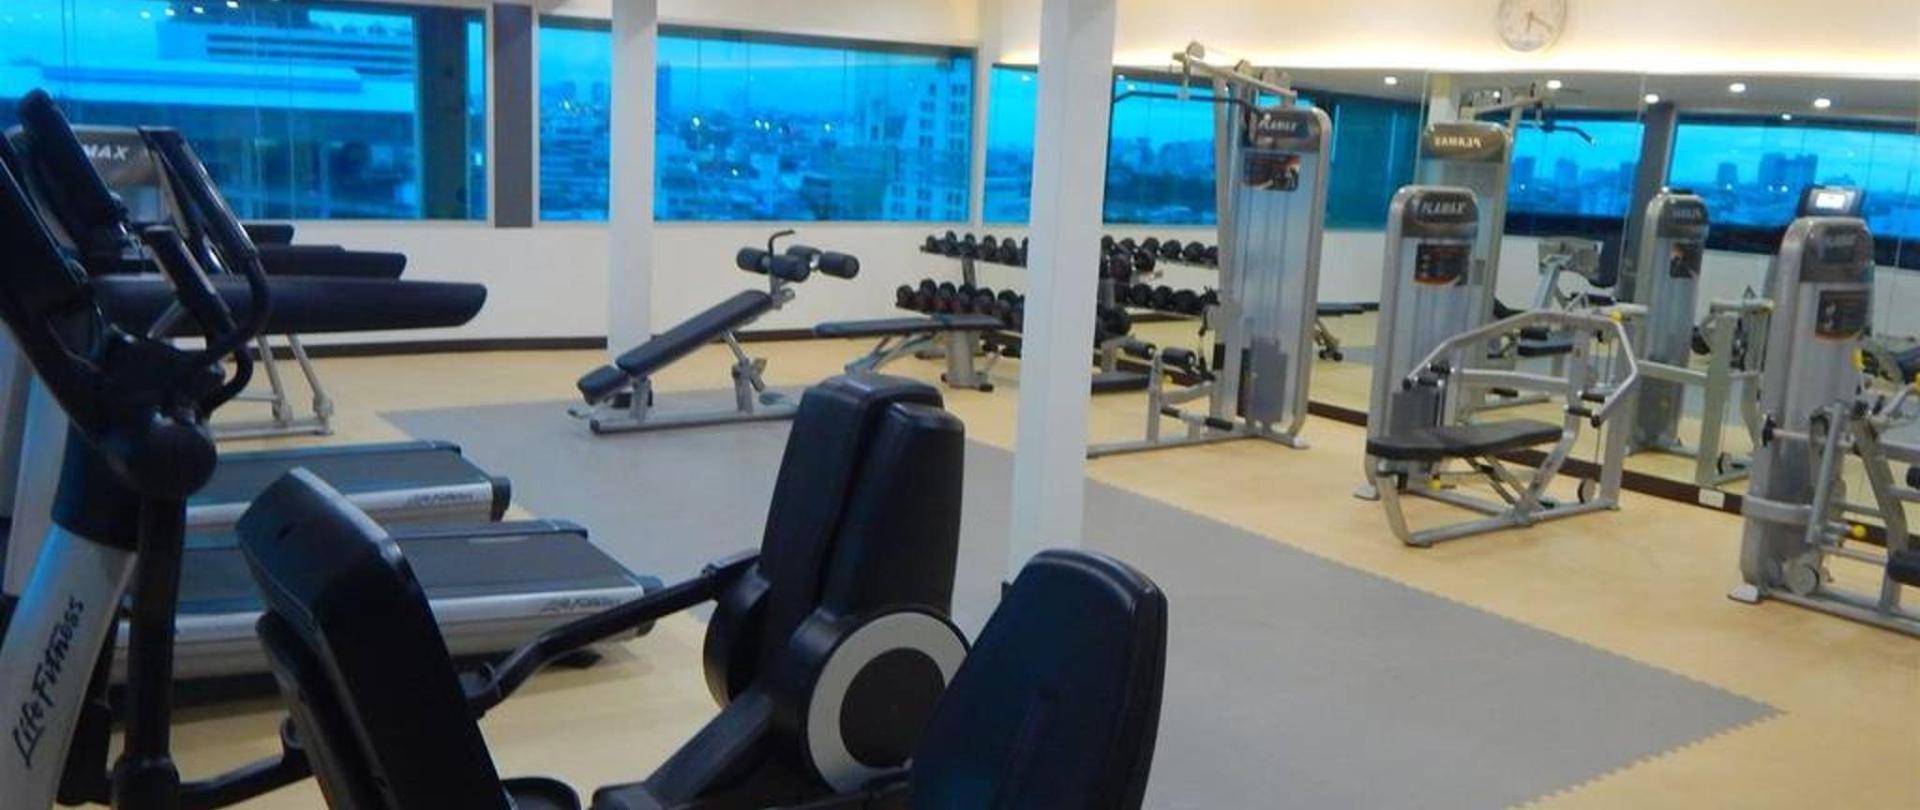 Hotel's Gym.jpg